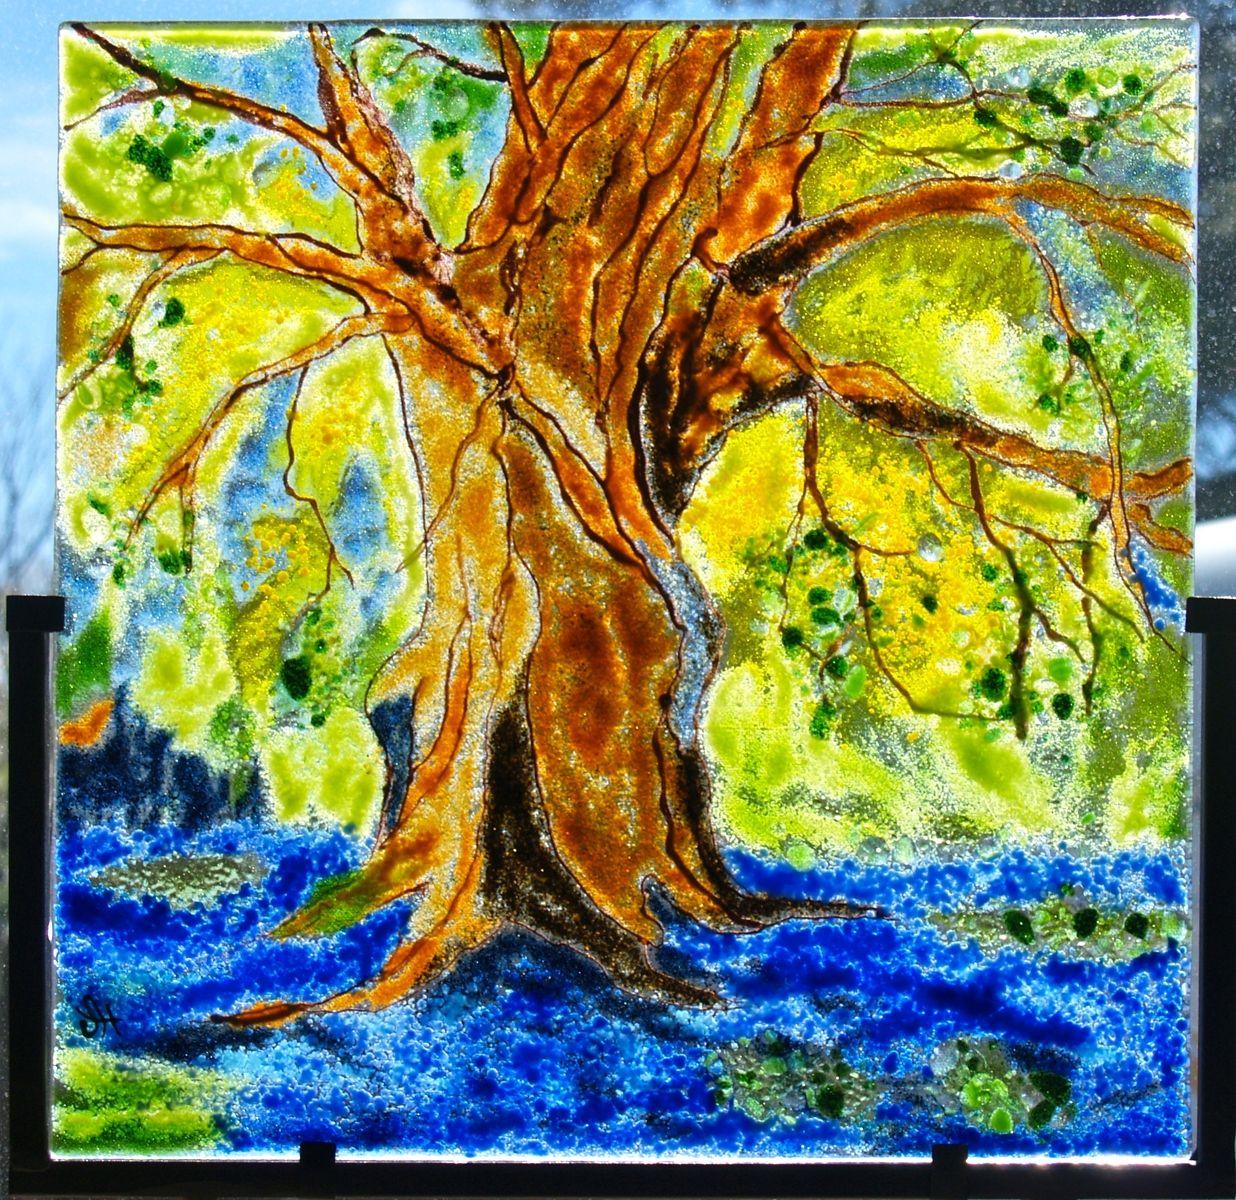 Handmade Quot Bluebonnets Under The Old Oak Tree Quot By Hartman